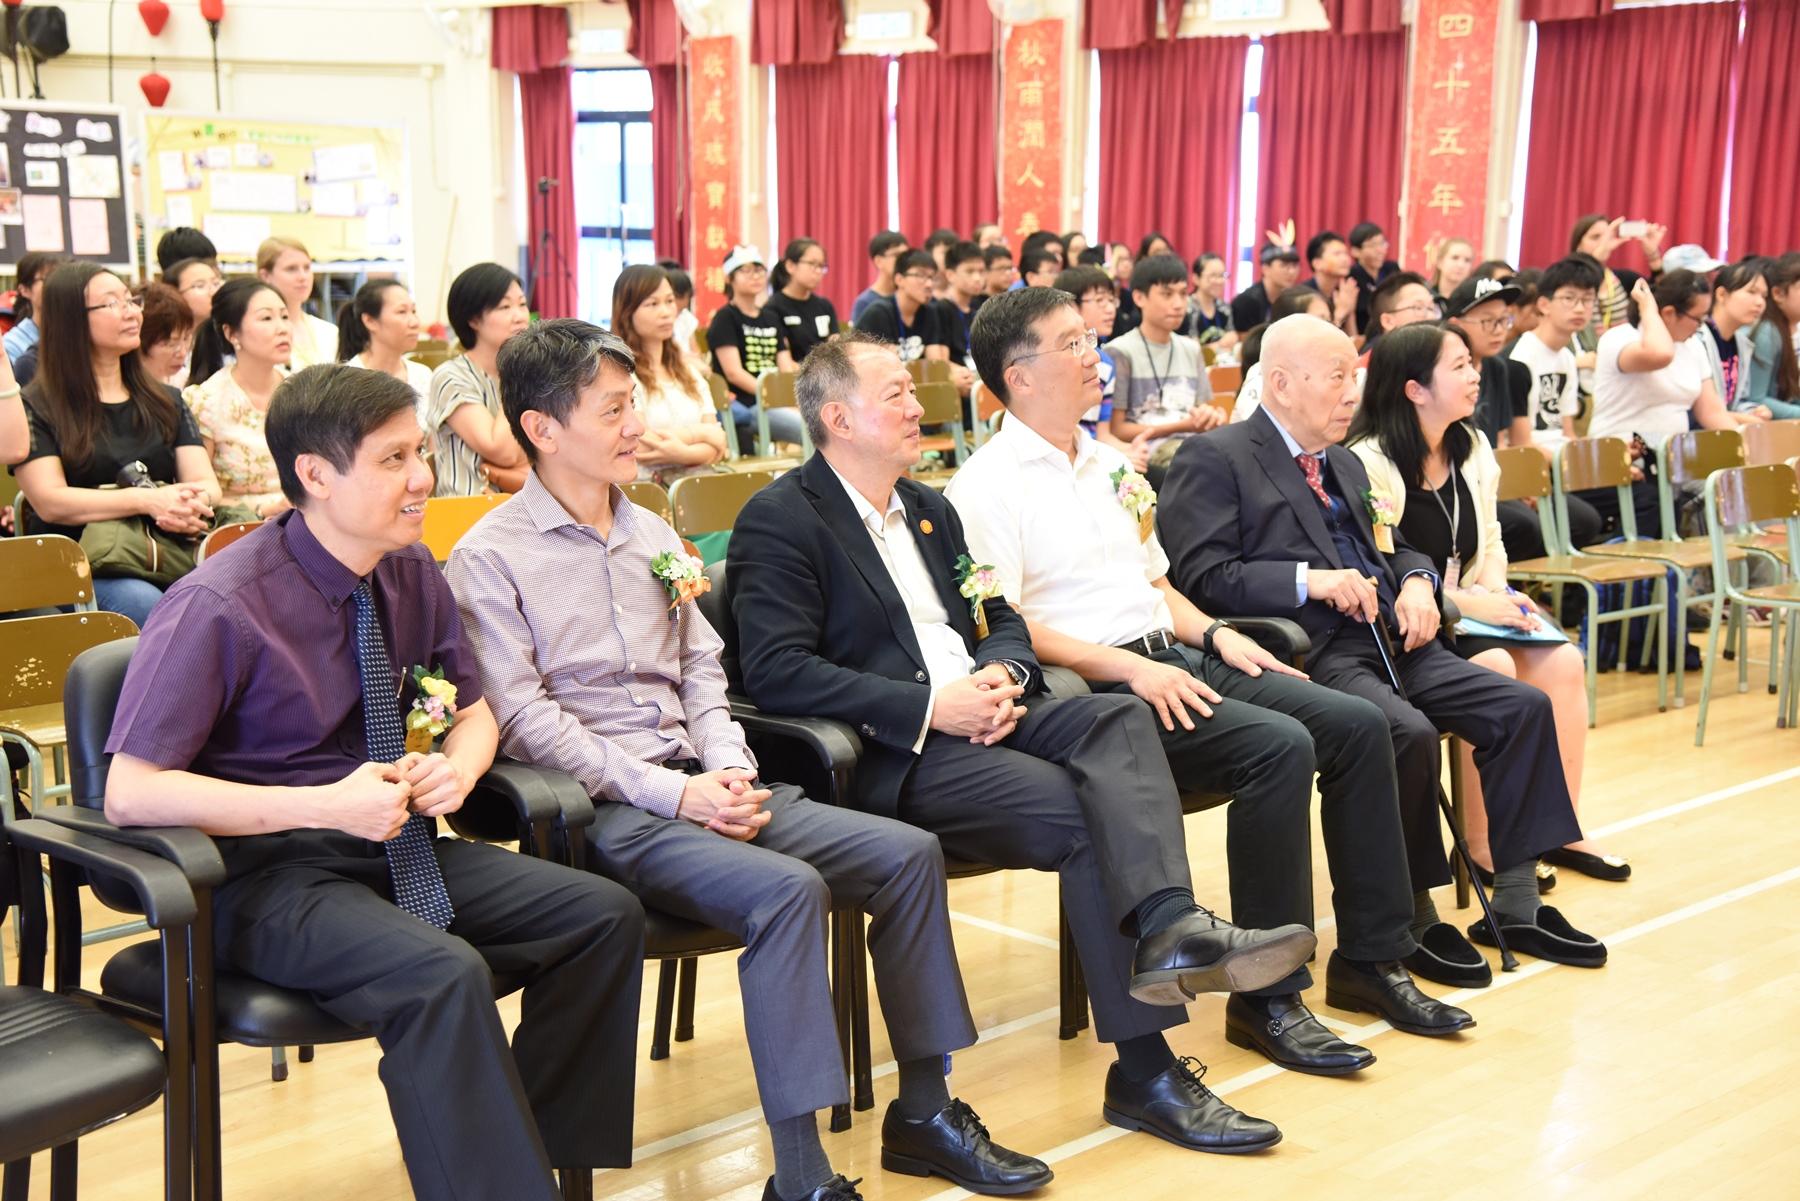 http://www.npc.edu.hk/sites/default/files/dsc_0210_3.jpg